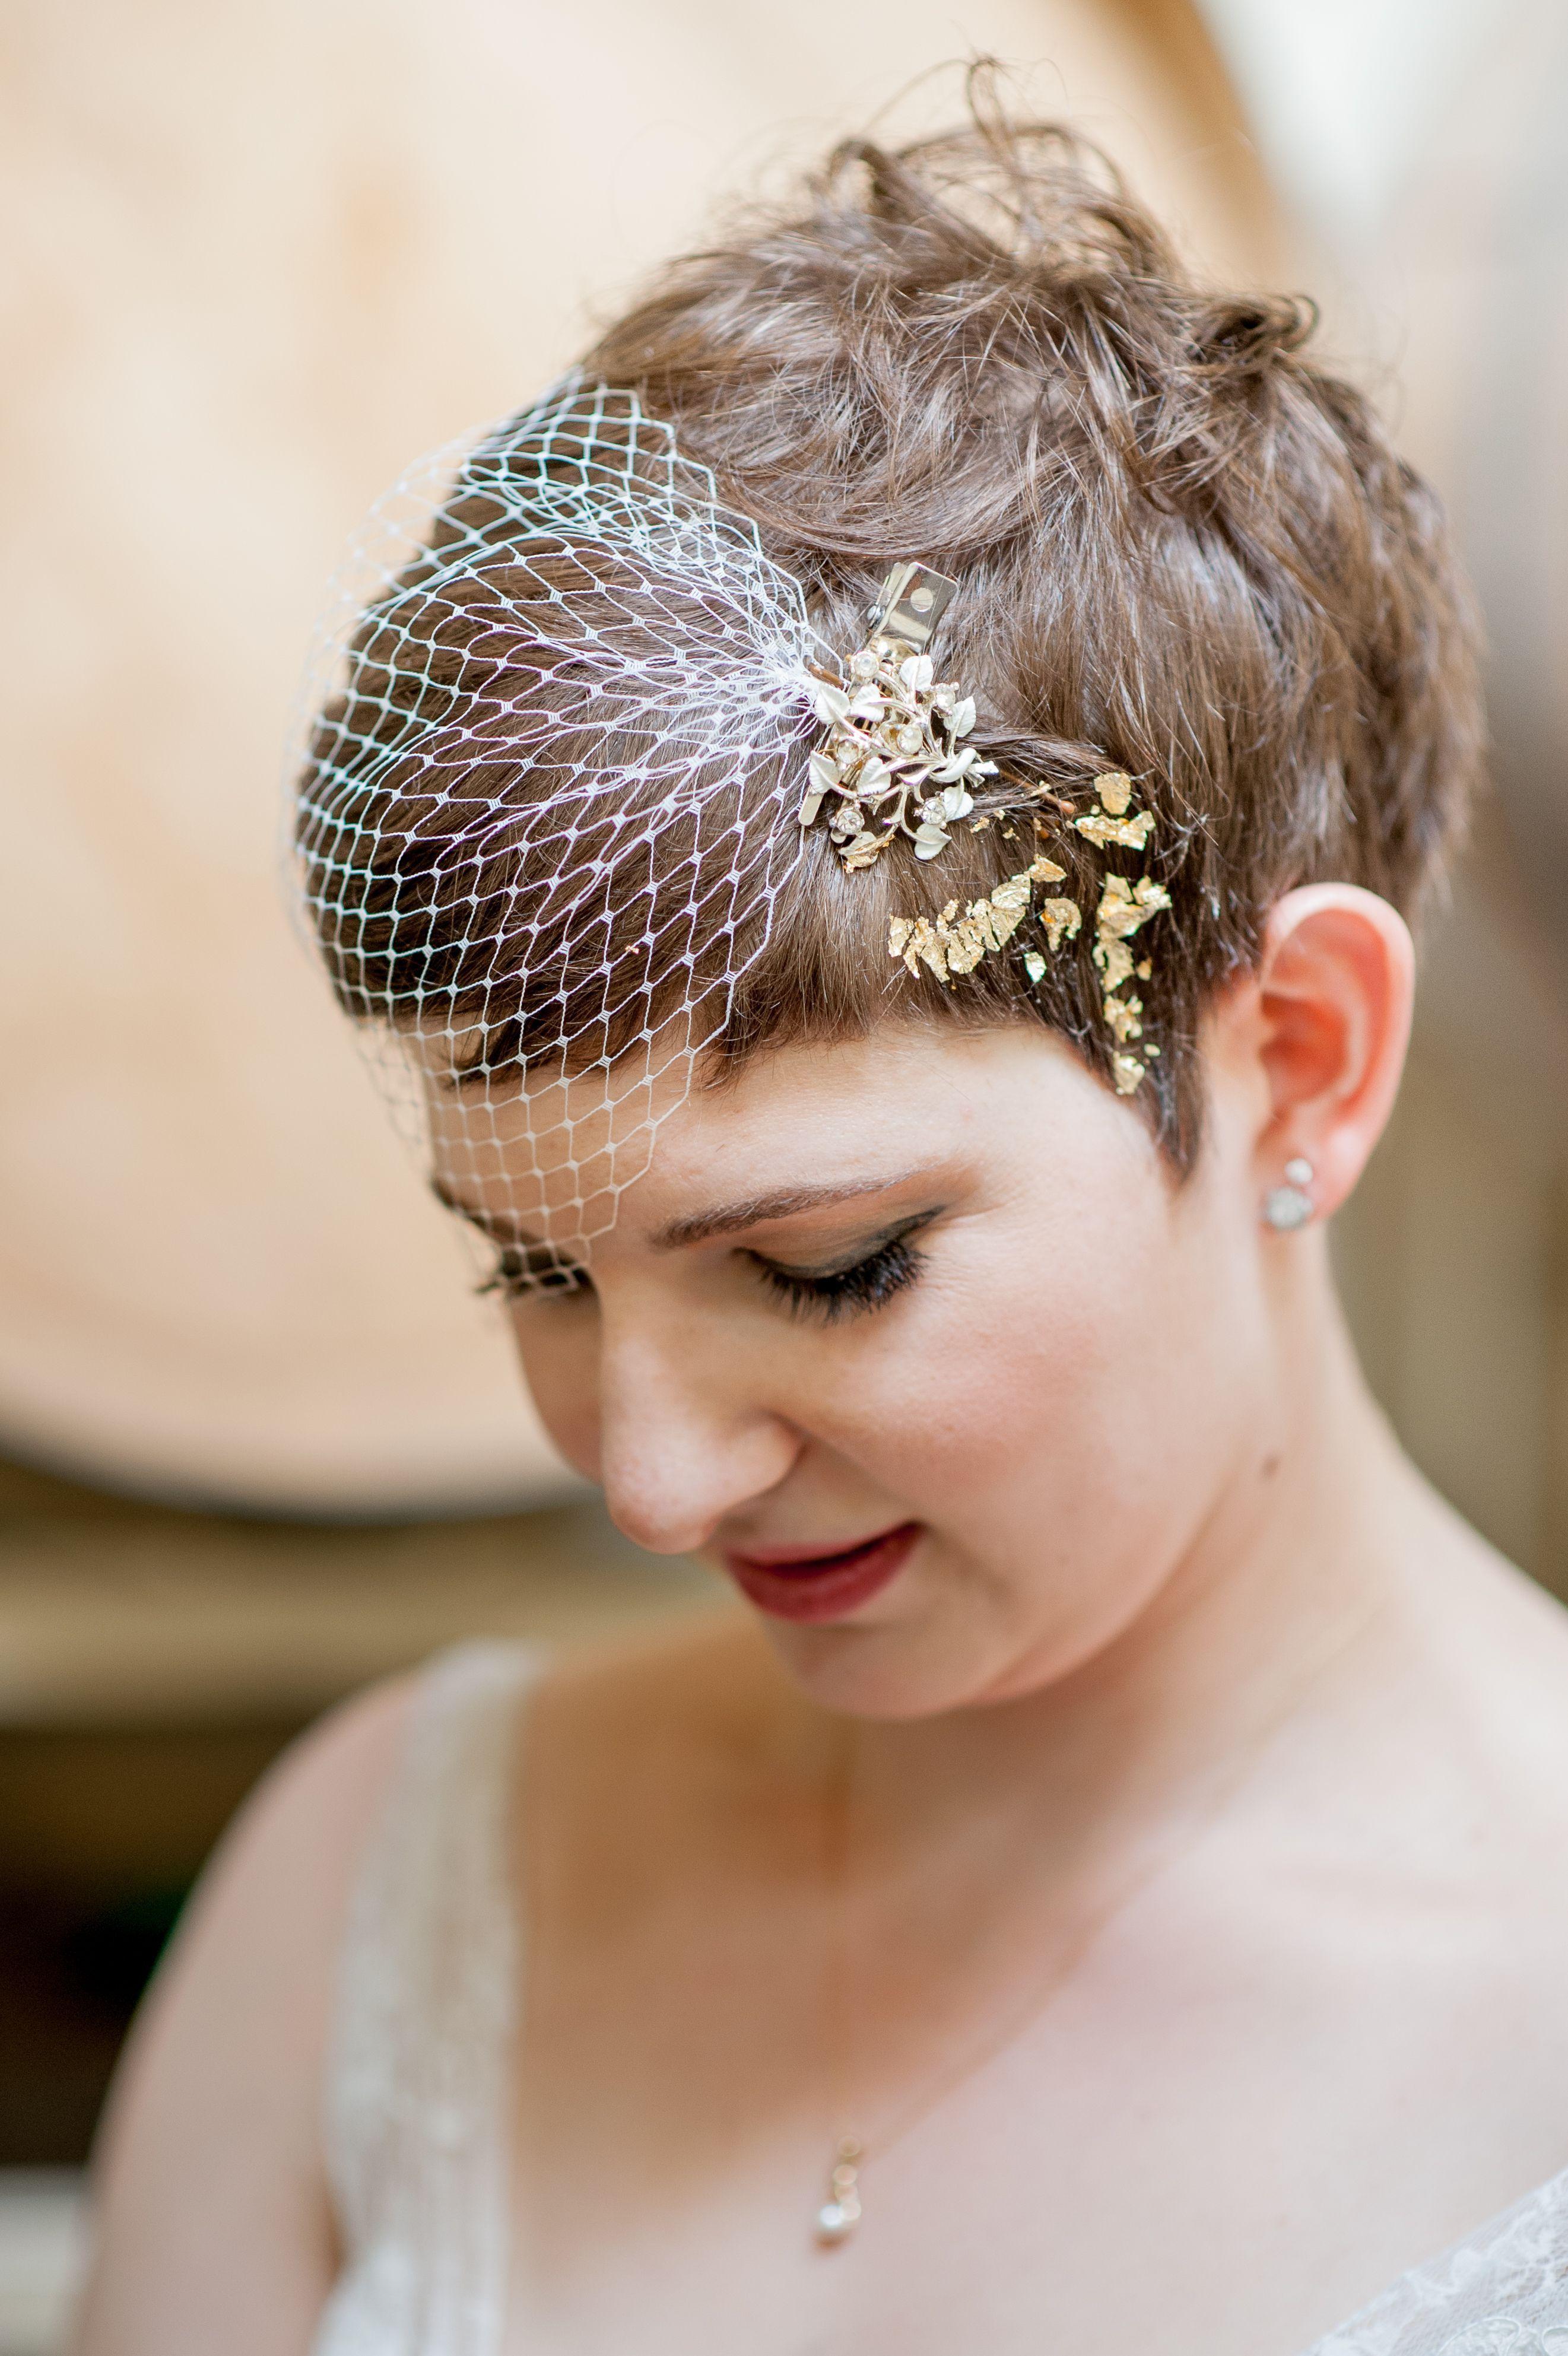 Inspirierende kurze Hochzeit Frisuren - Neu Frisuren 2018